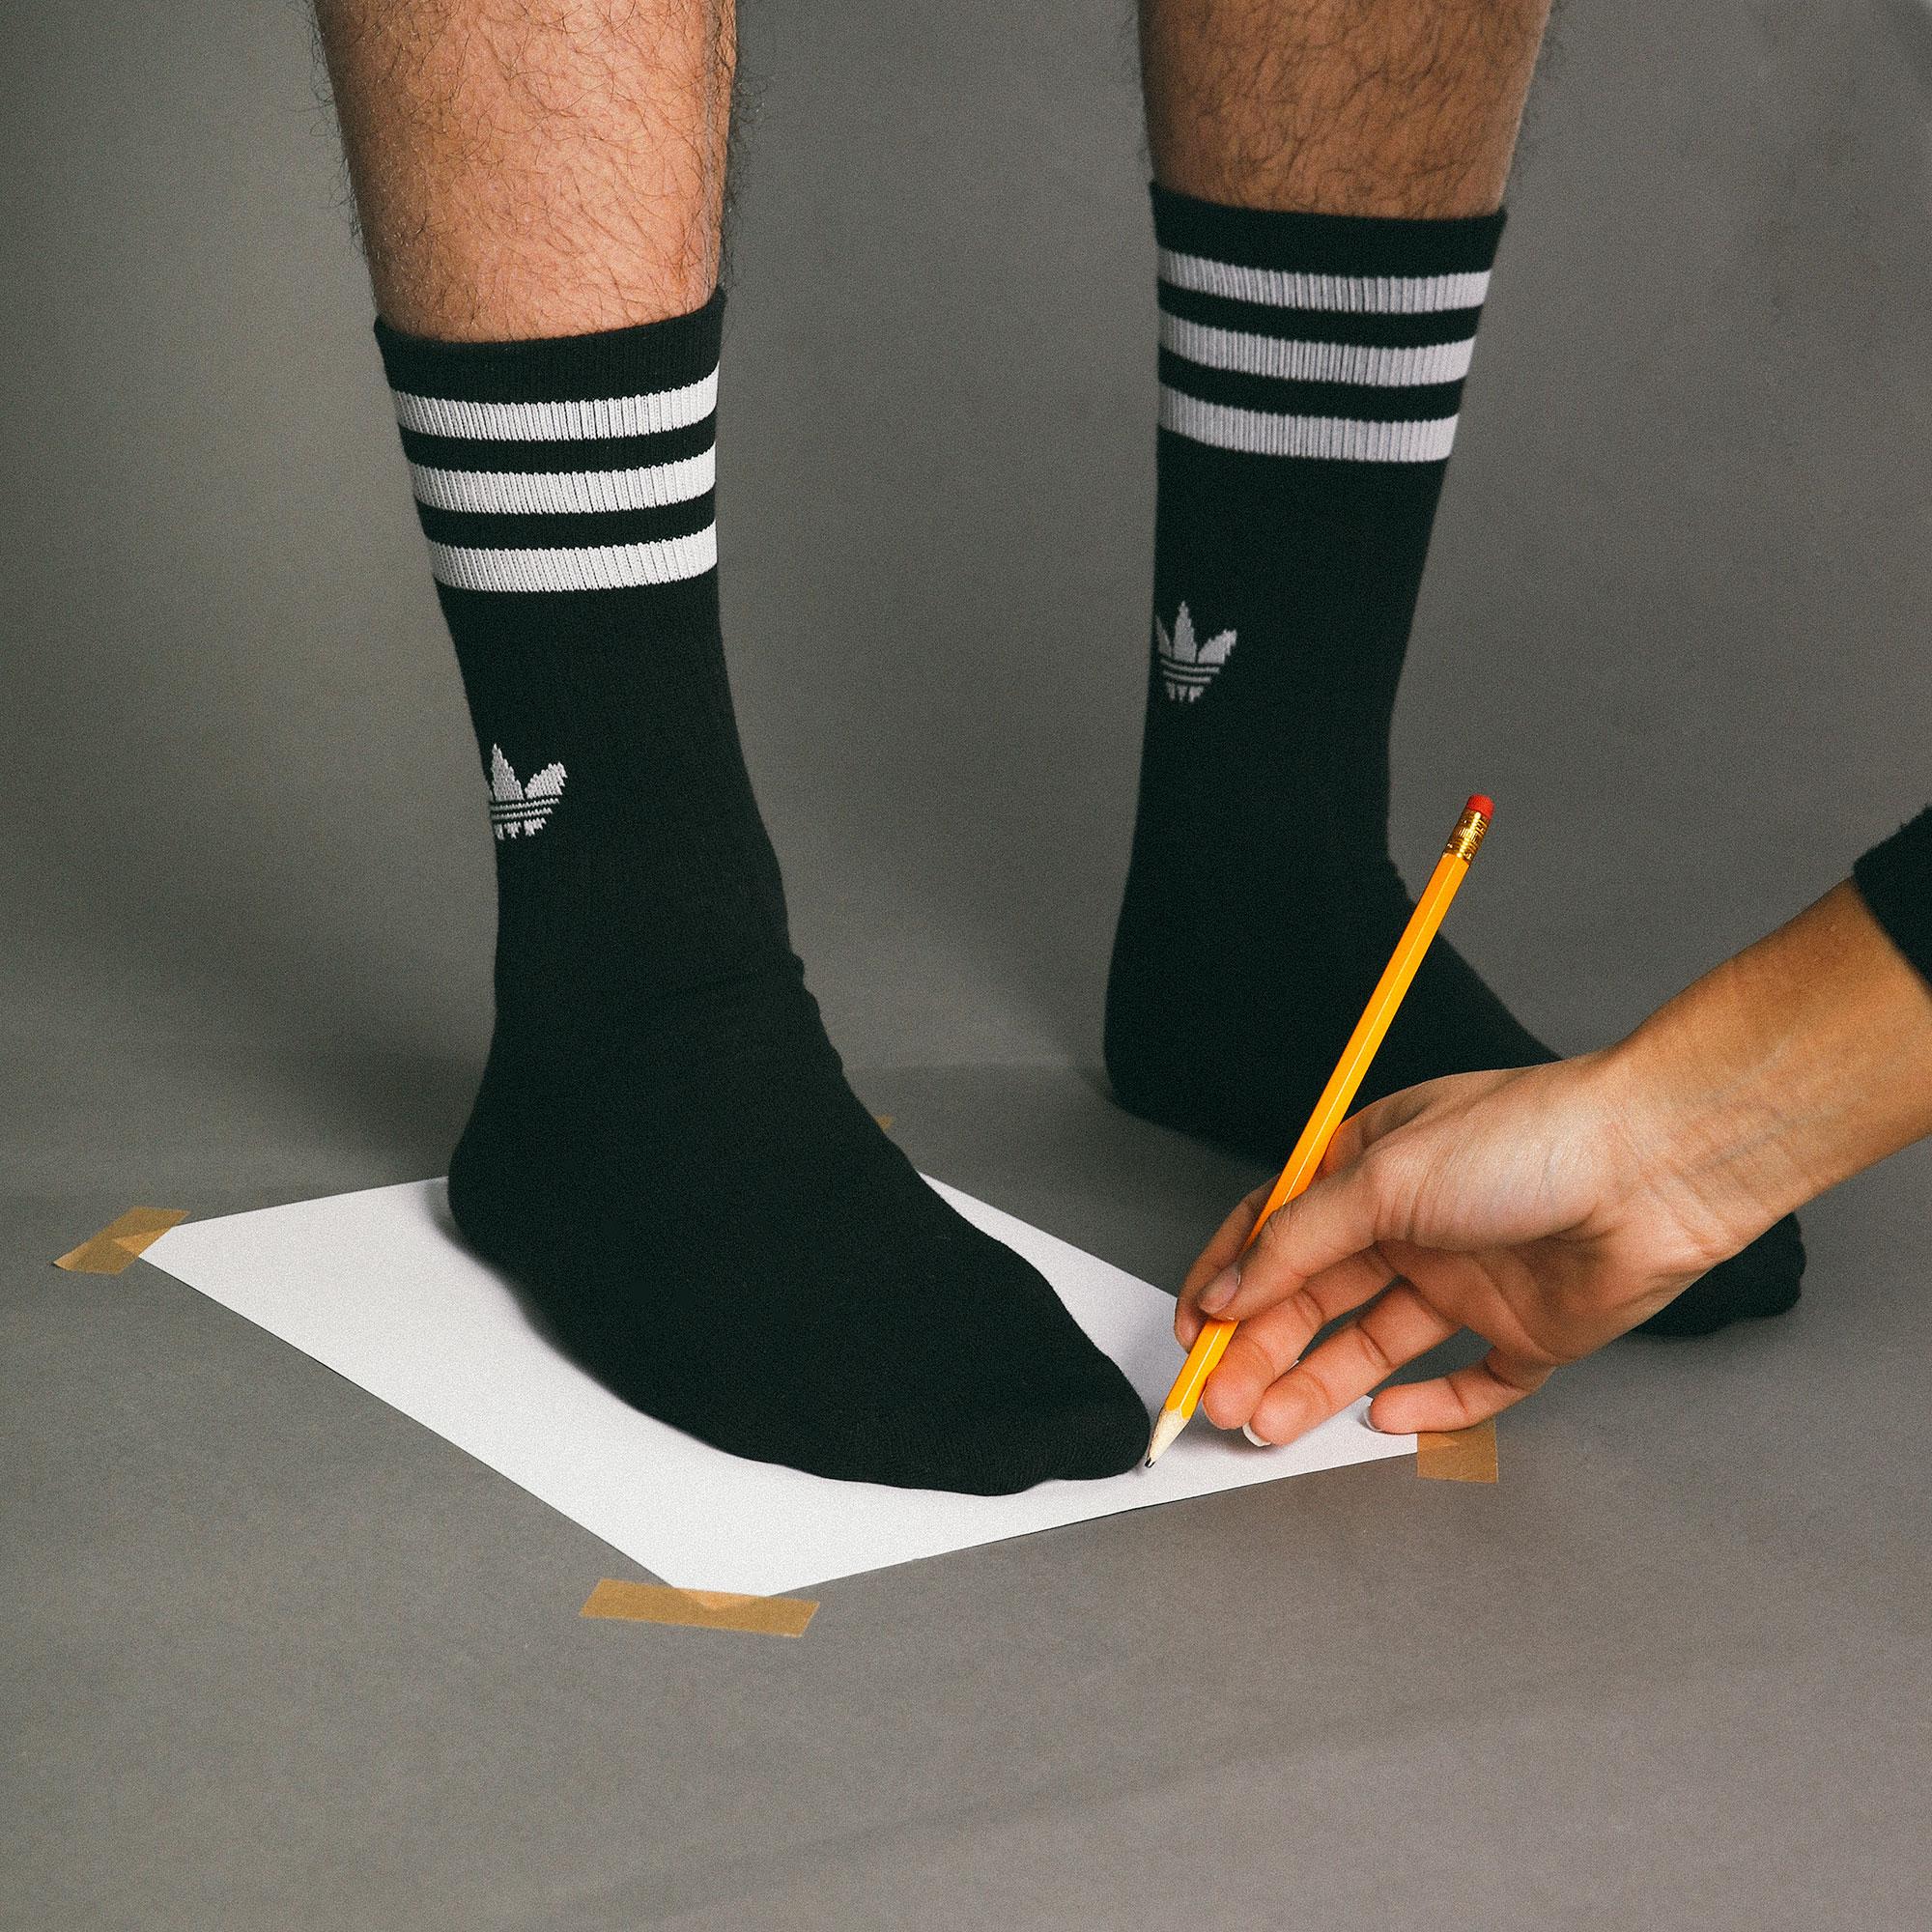 Sneaker sizeguide step 2